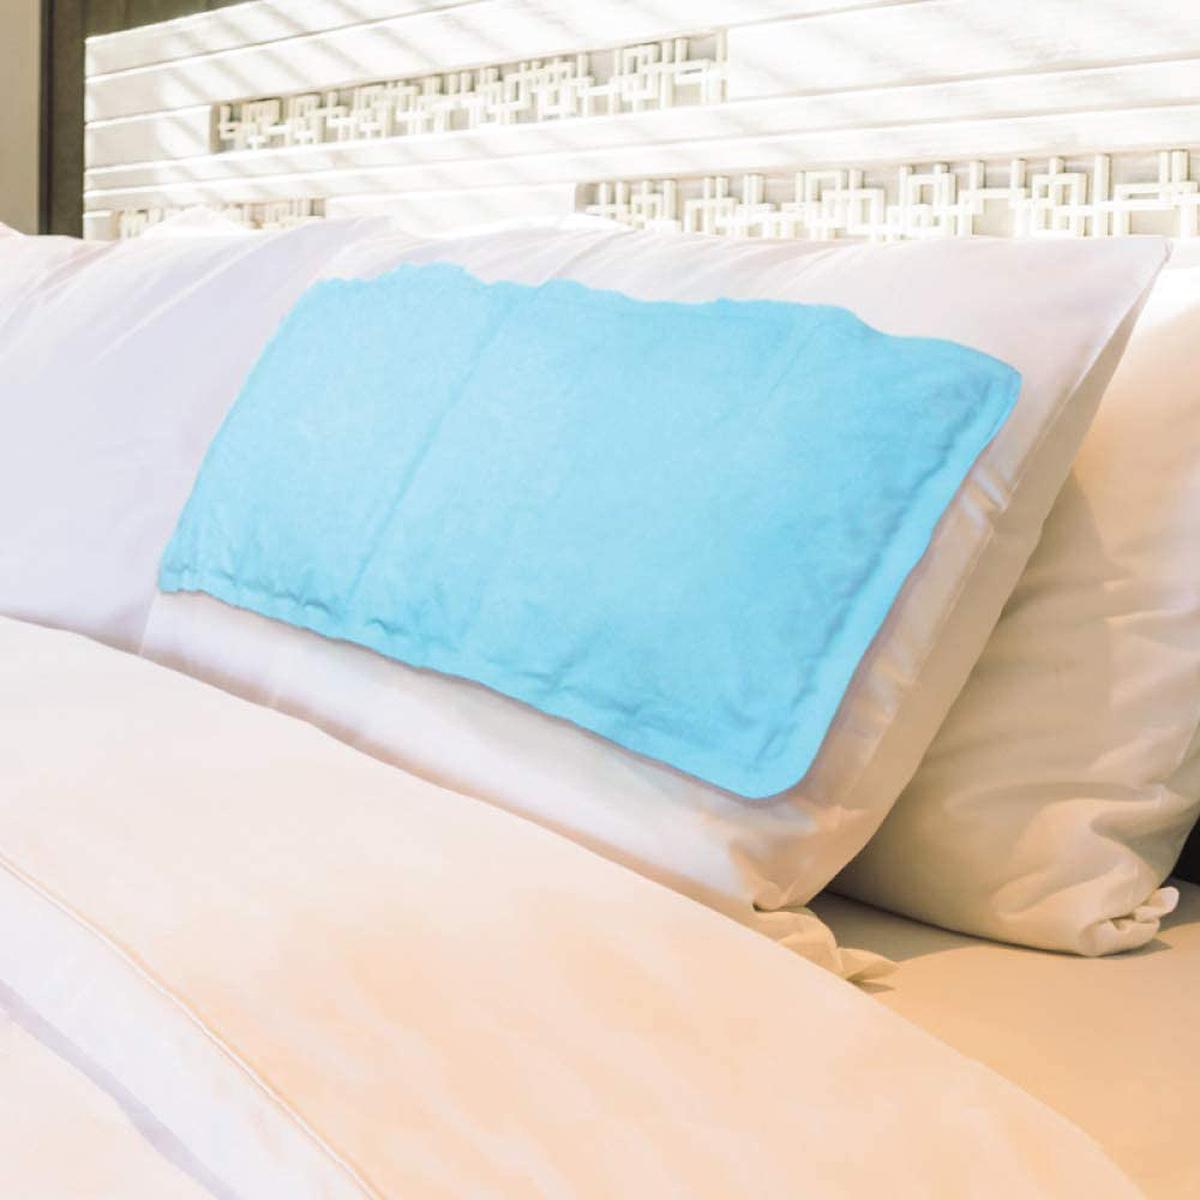 cooling-bedding-amazon-pillow-gel-insert